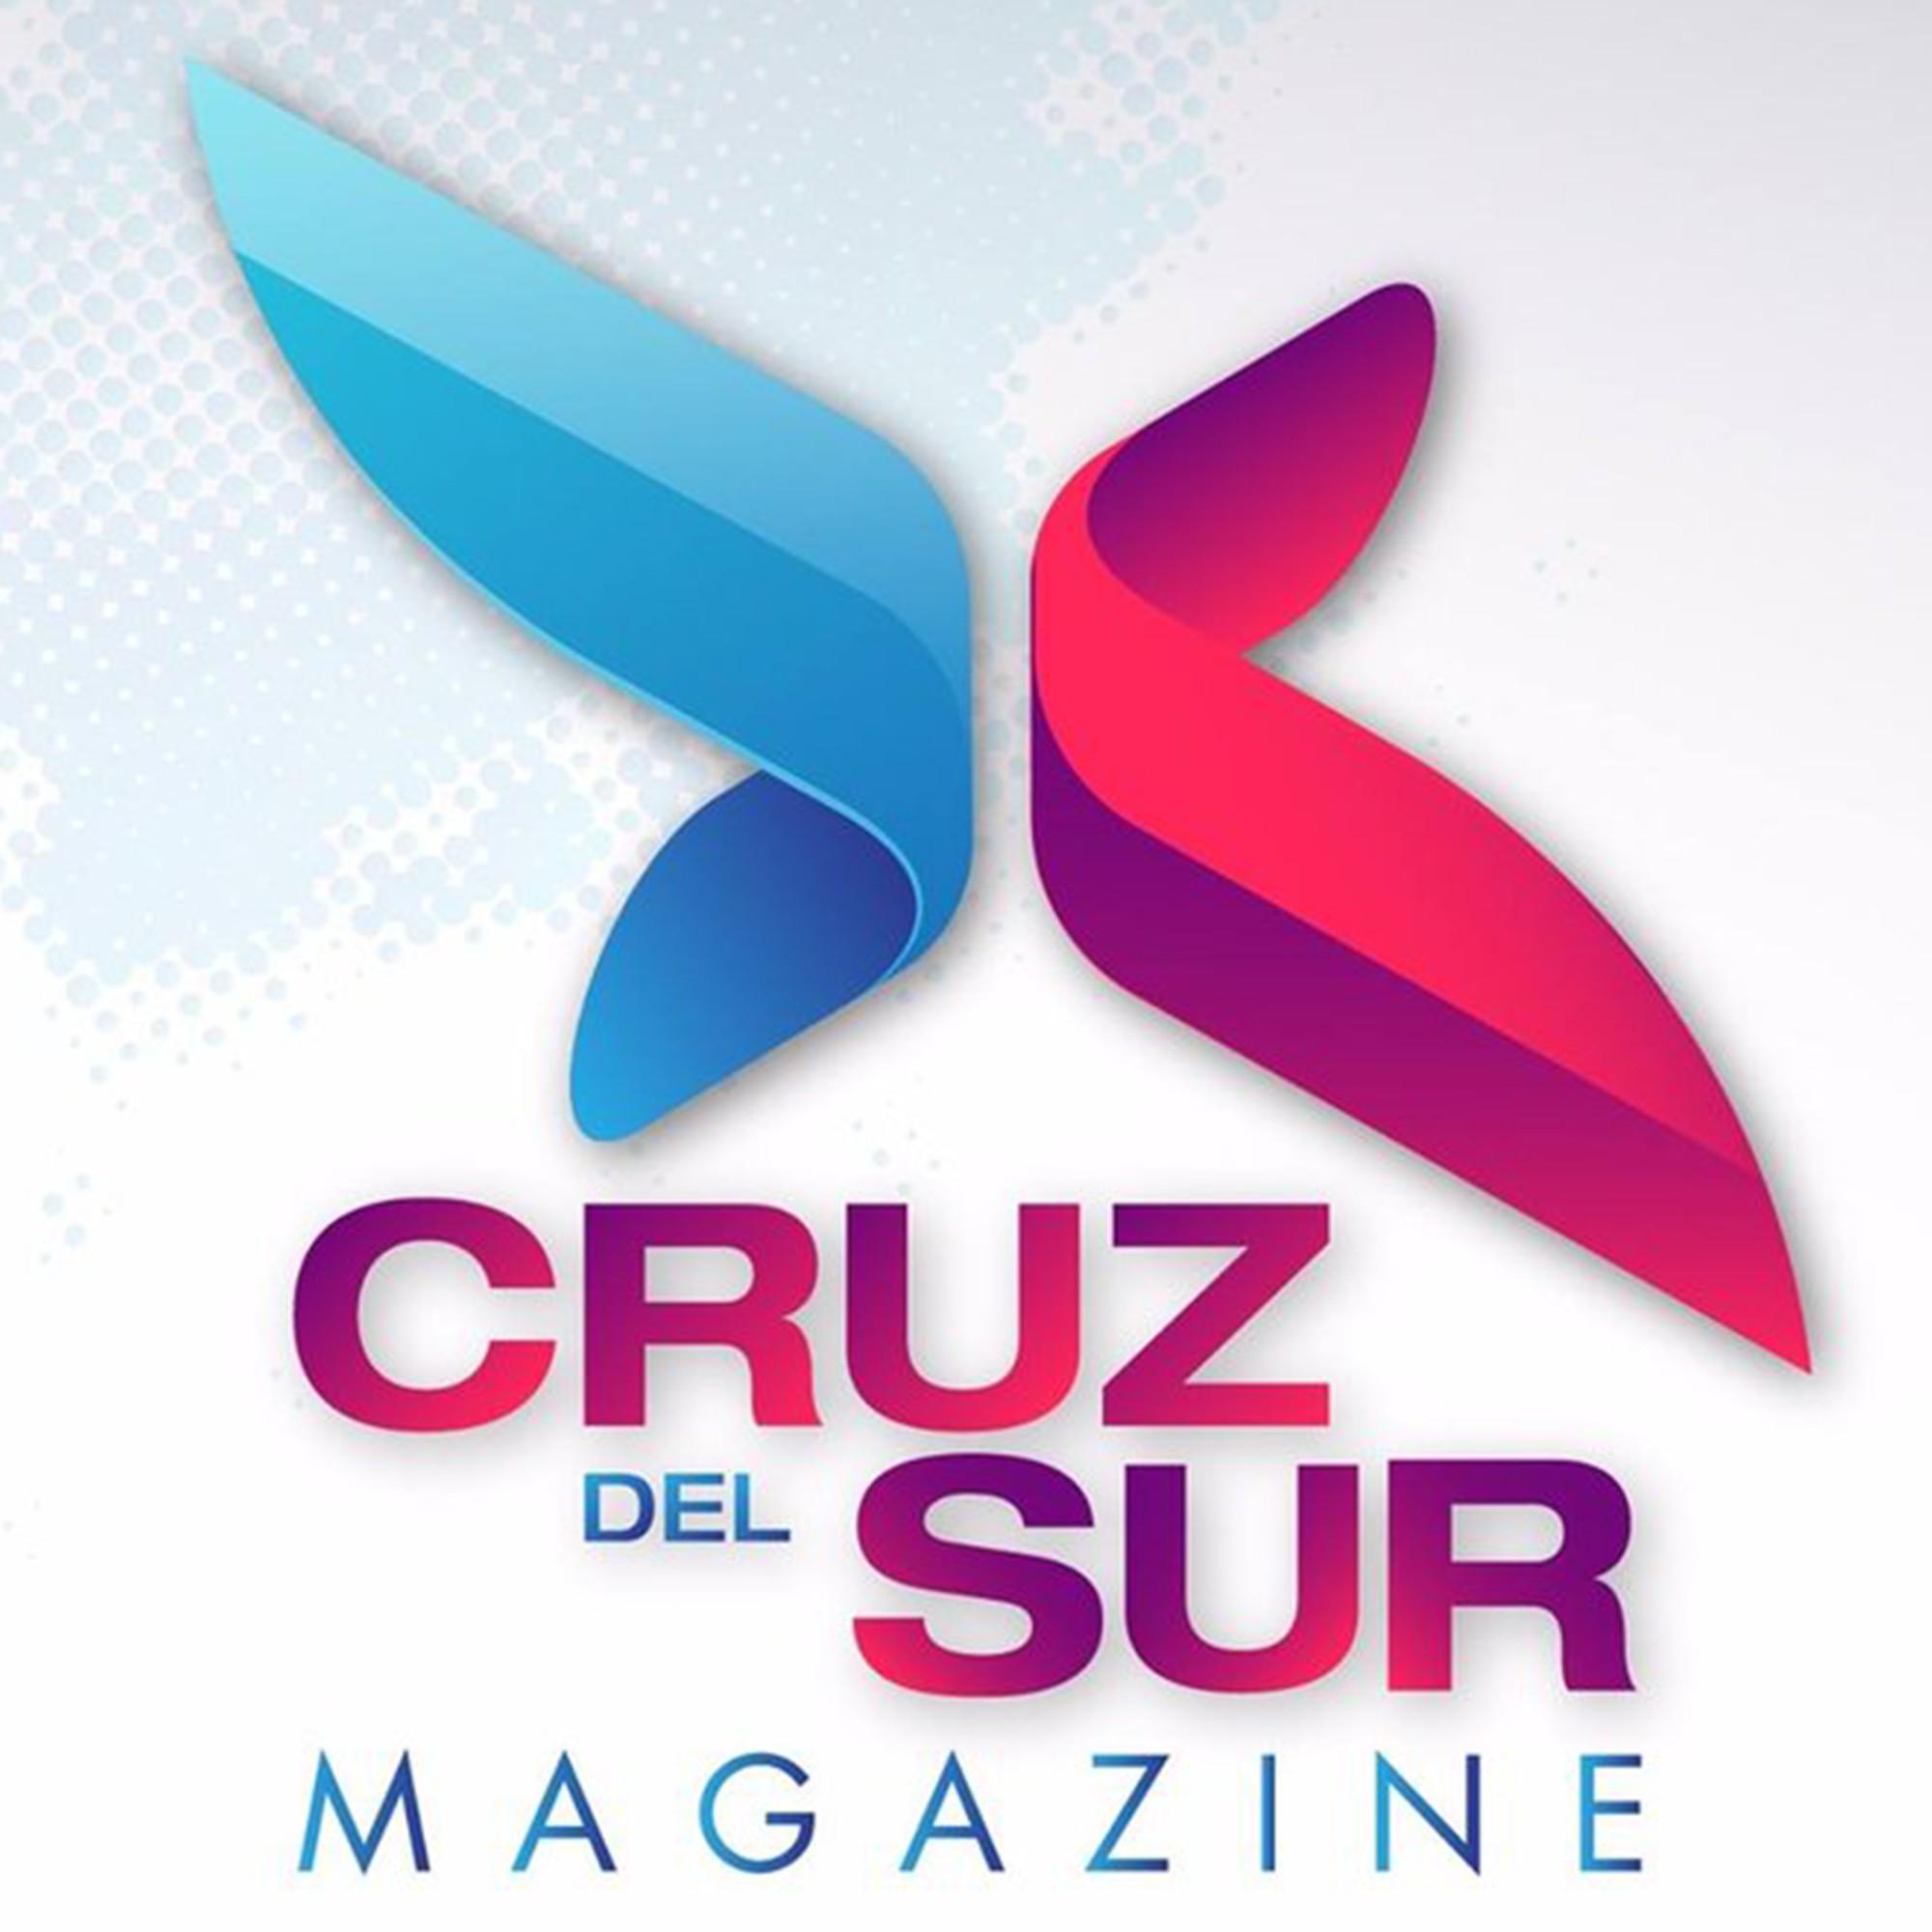 CRUZ-SUR